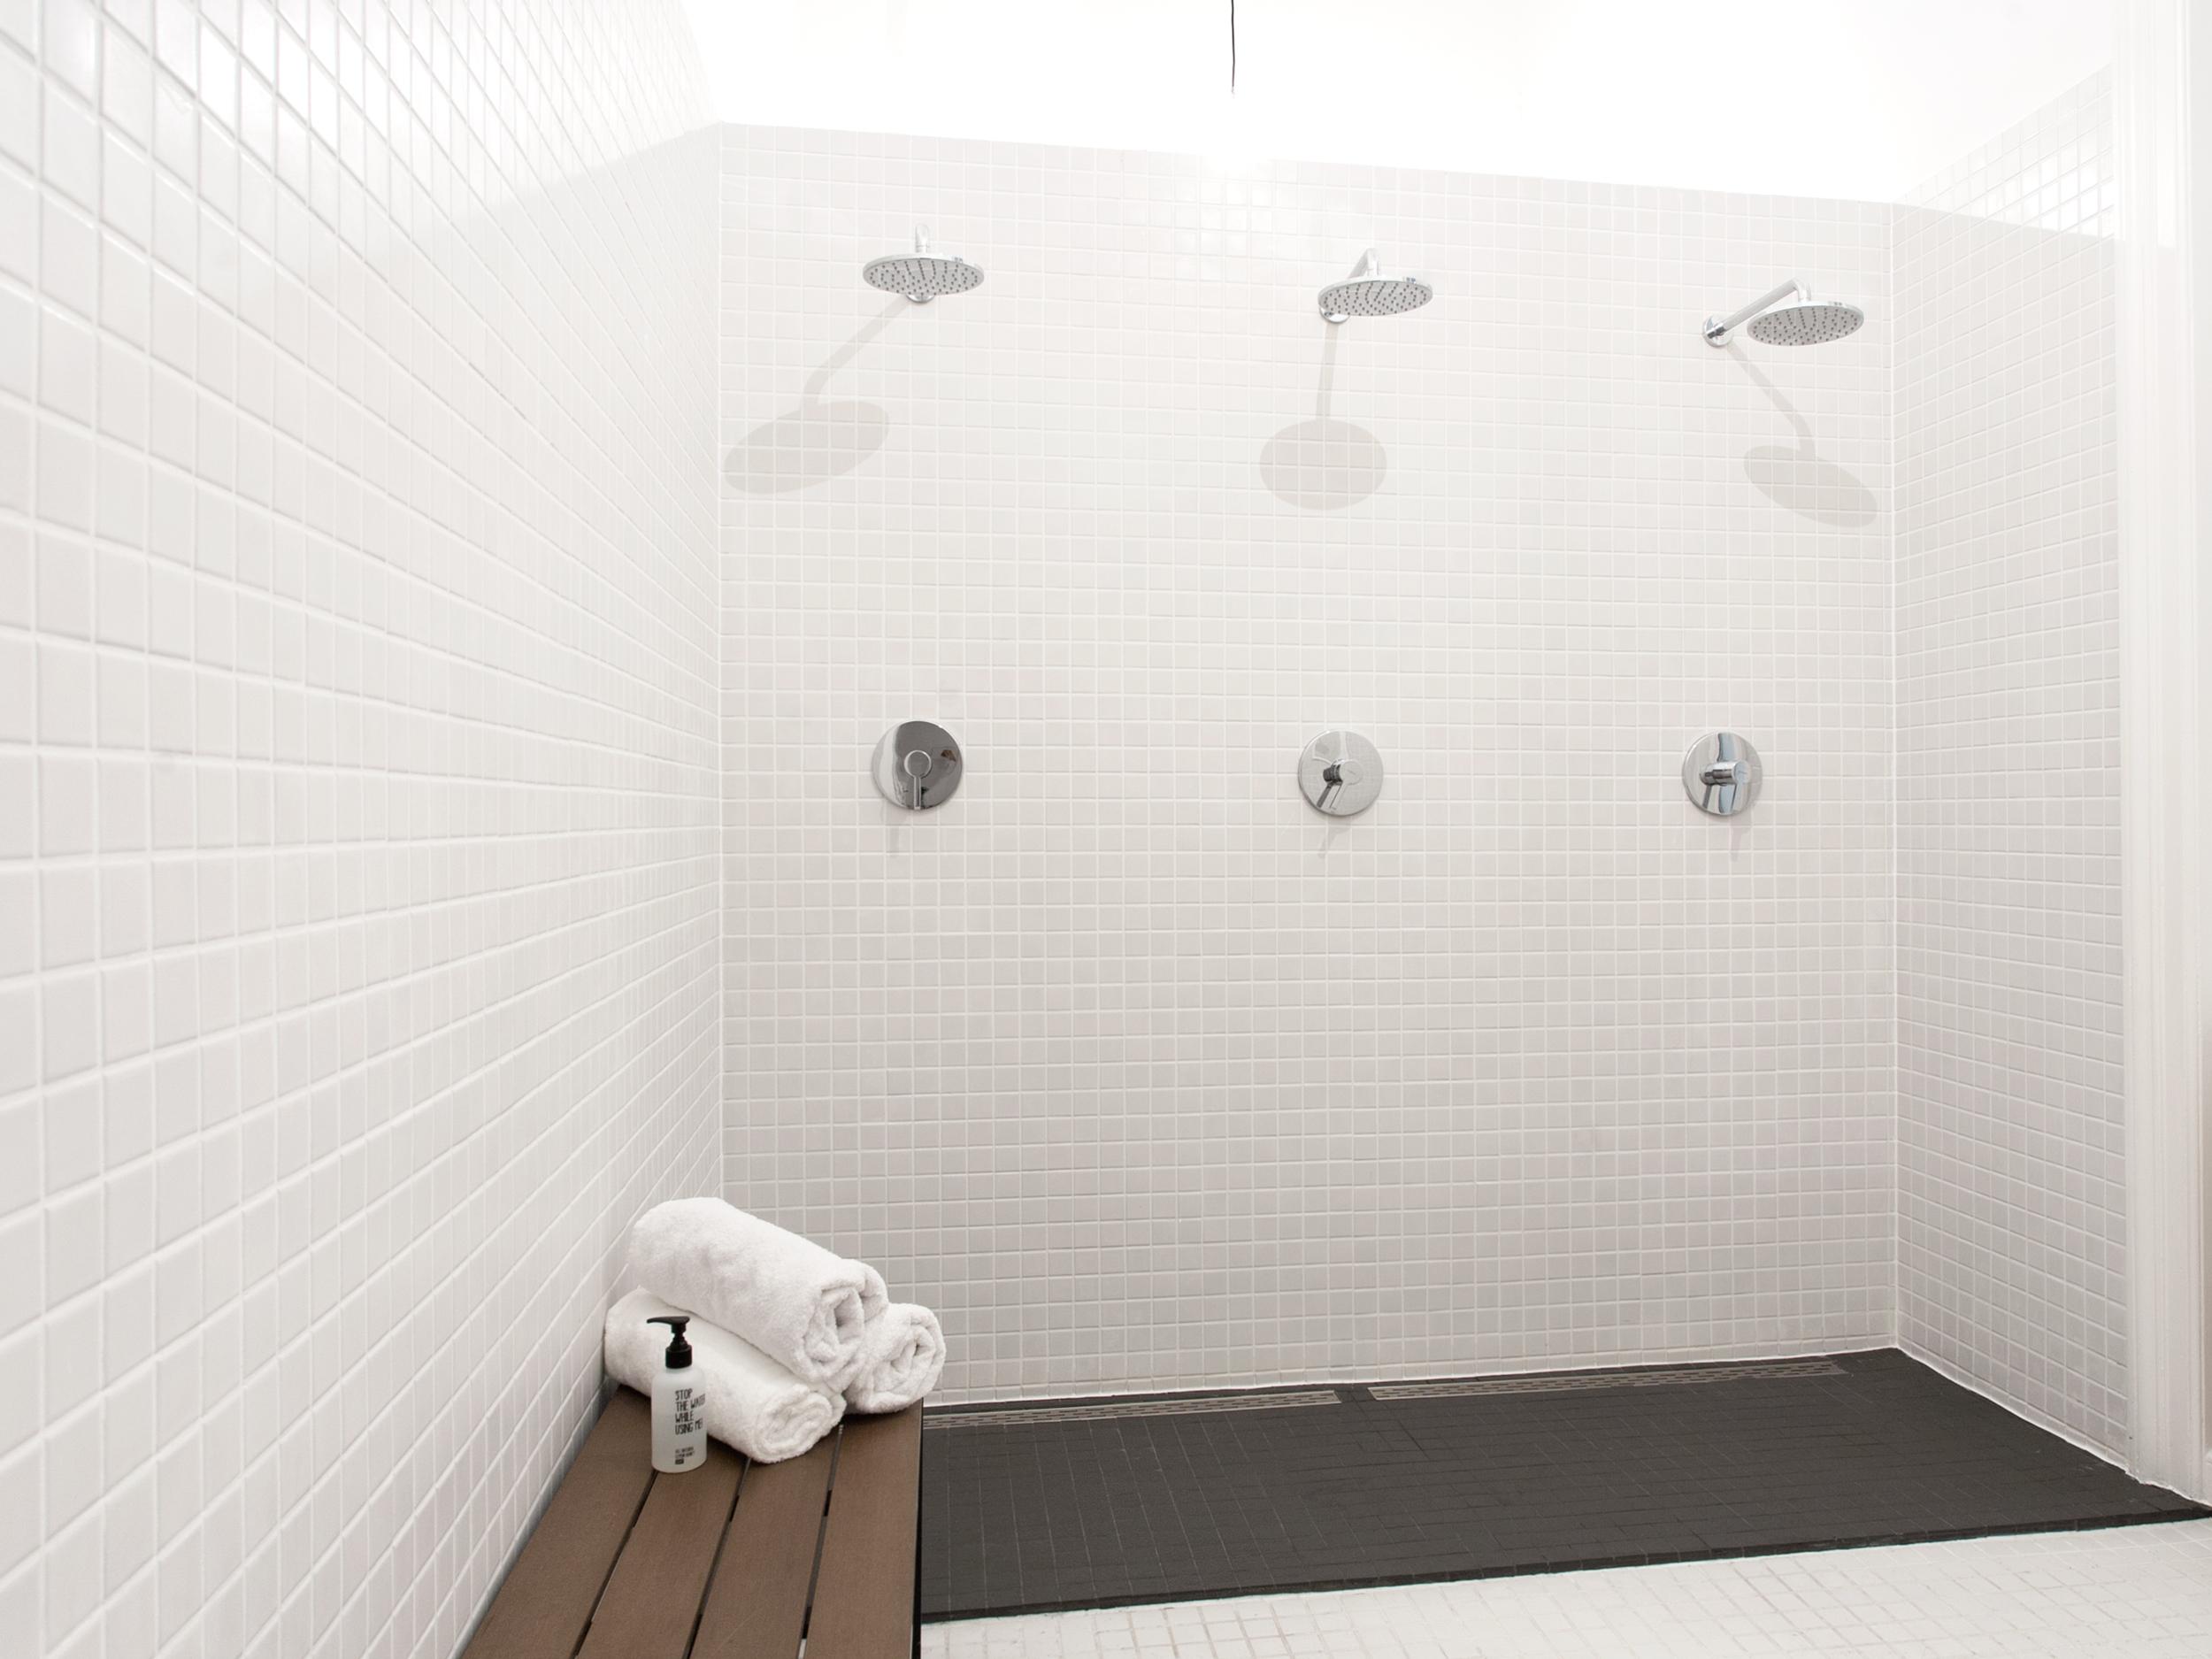 oneyoga_duschen